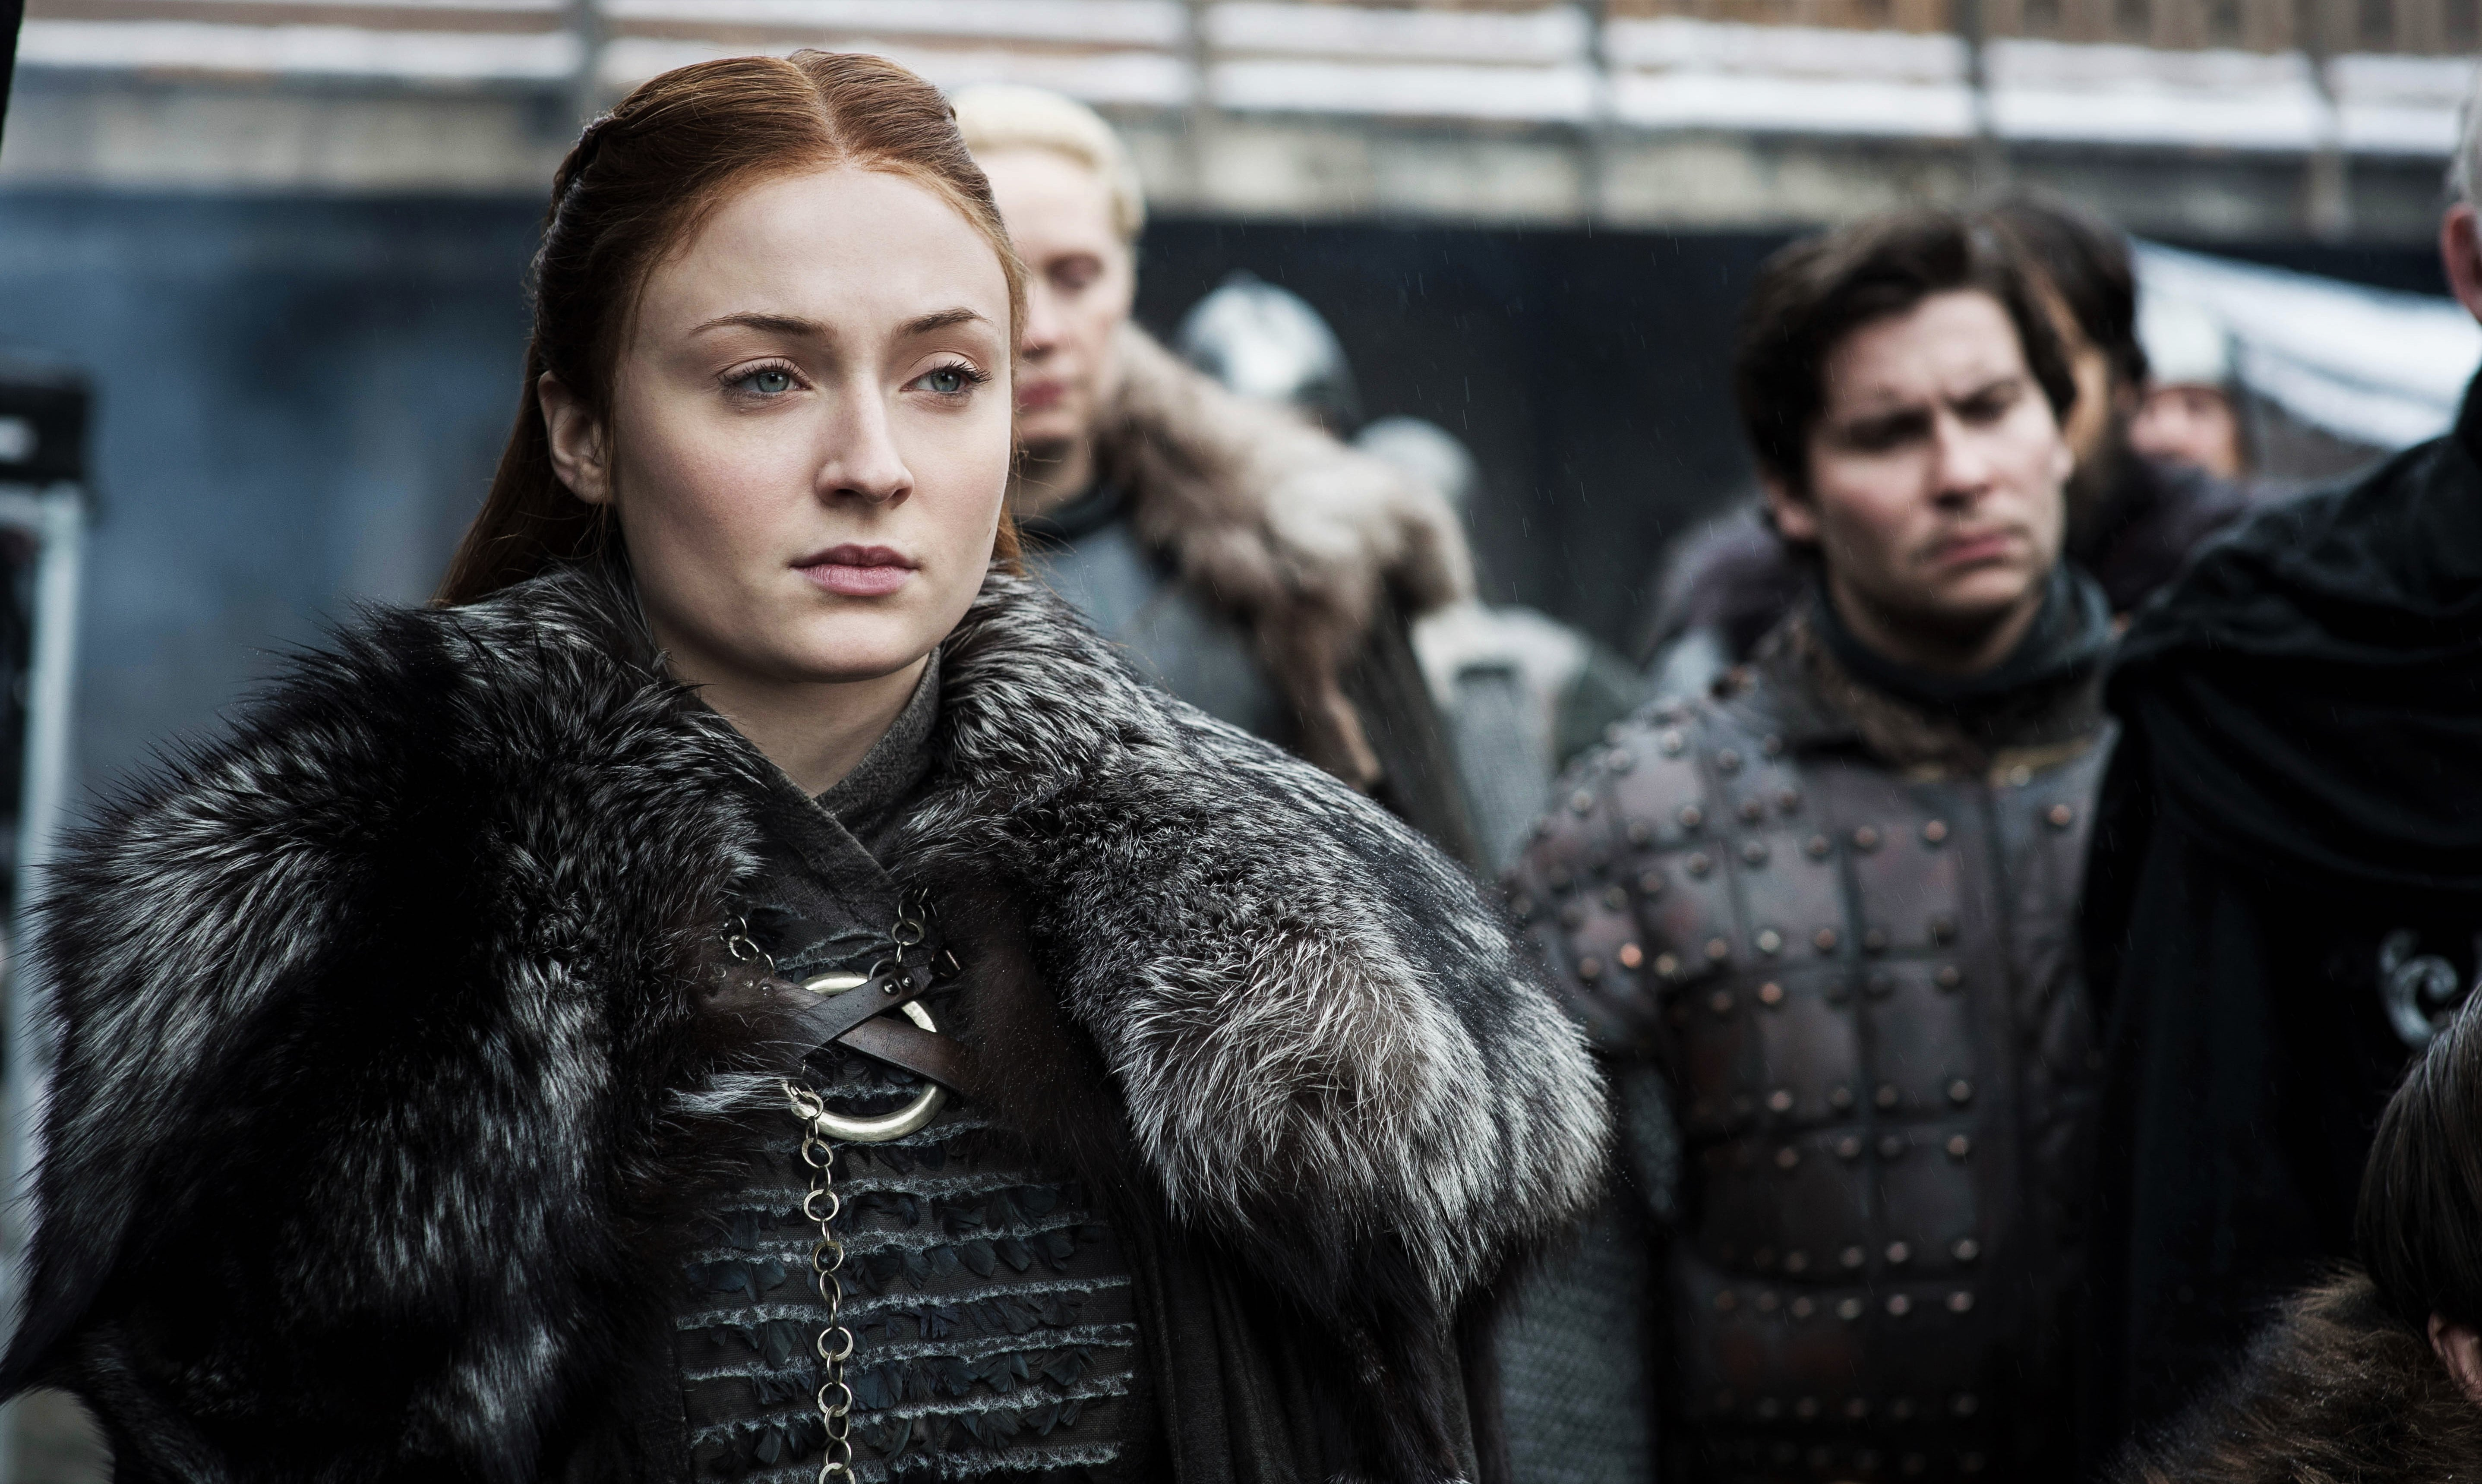 Sansa Stark Brienne of Tarth Podrick Payne Bran Stark Maester Wolkan Winterfell Courtyard Season 8